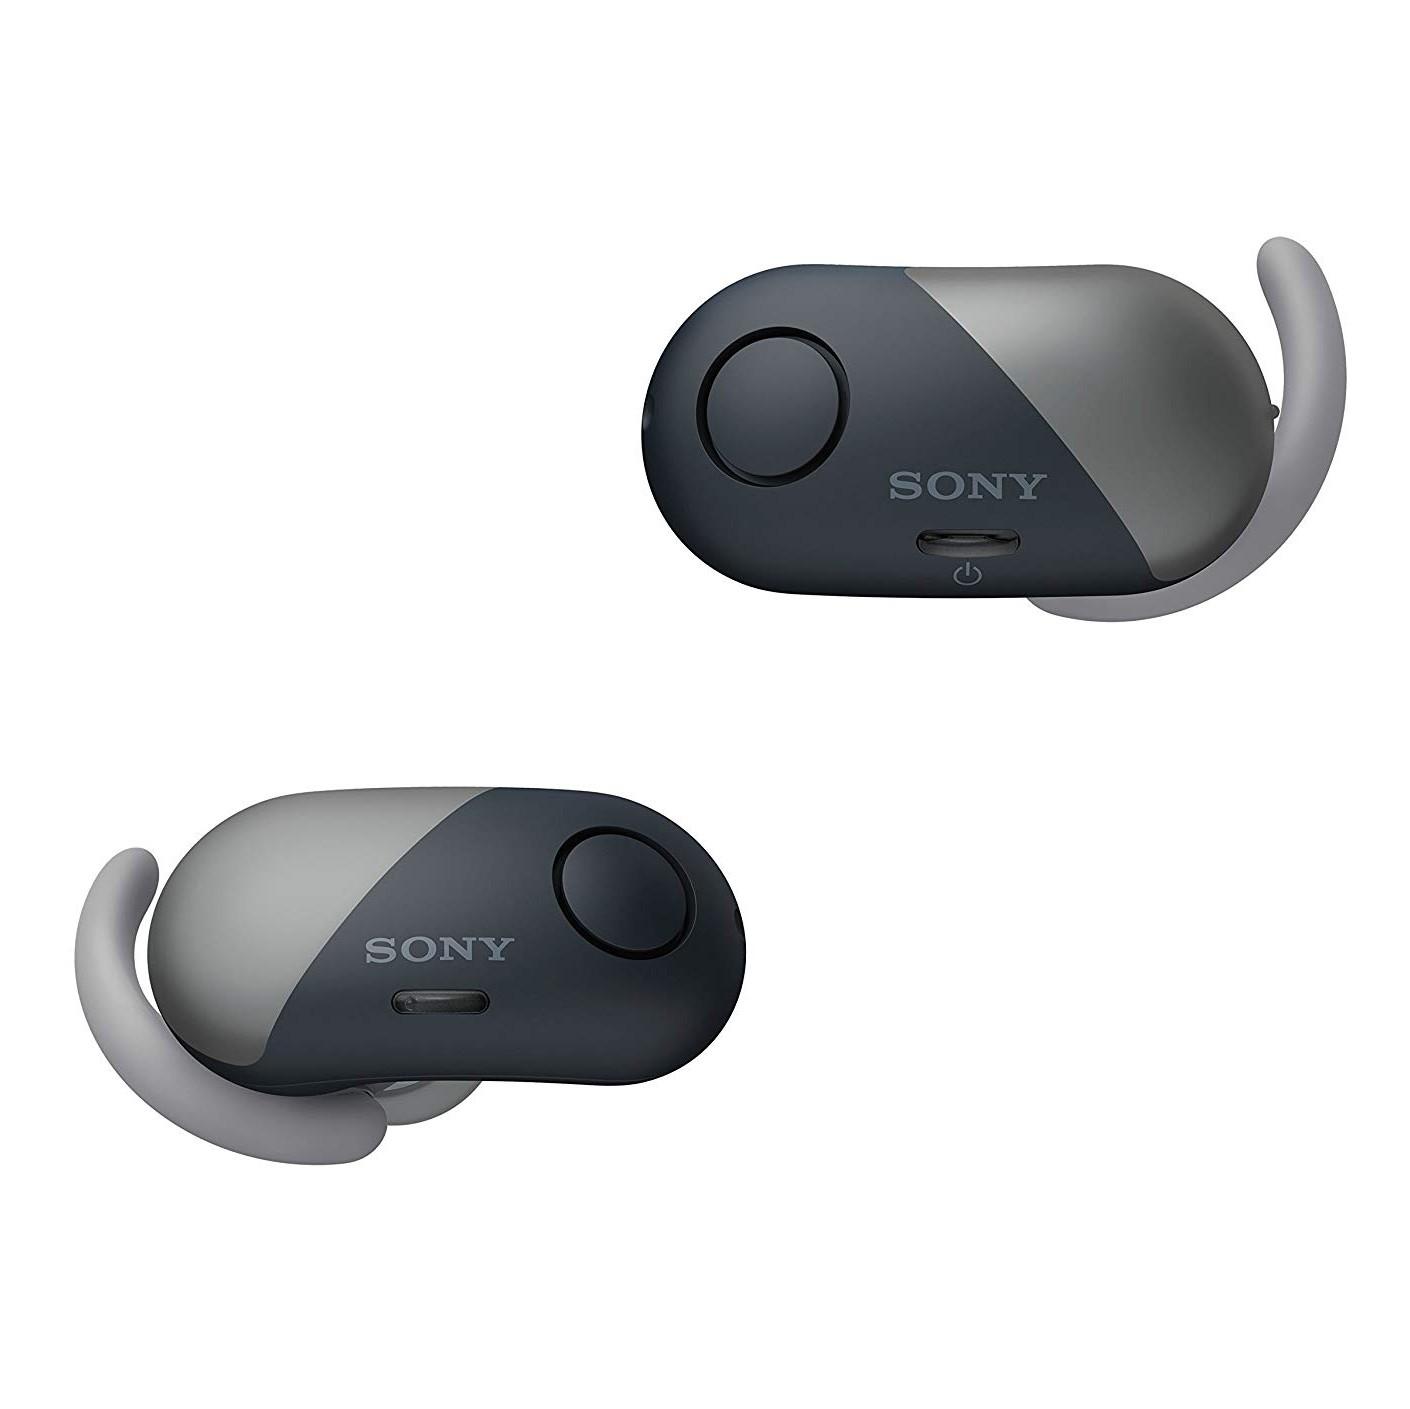 Refurb** Sony Sport True Wireless Noise Canceling Earbud Headphones - Black (Refurbished) $49.95